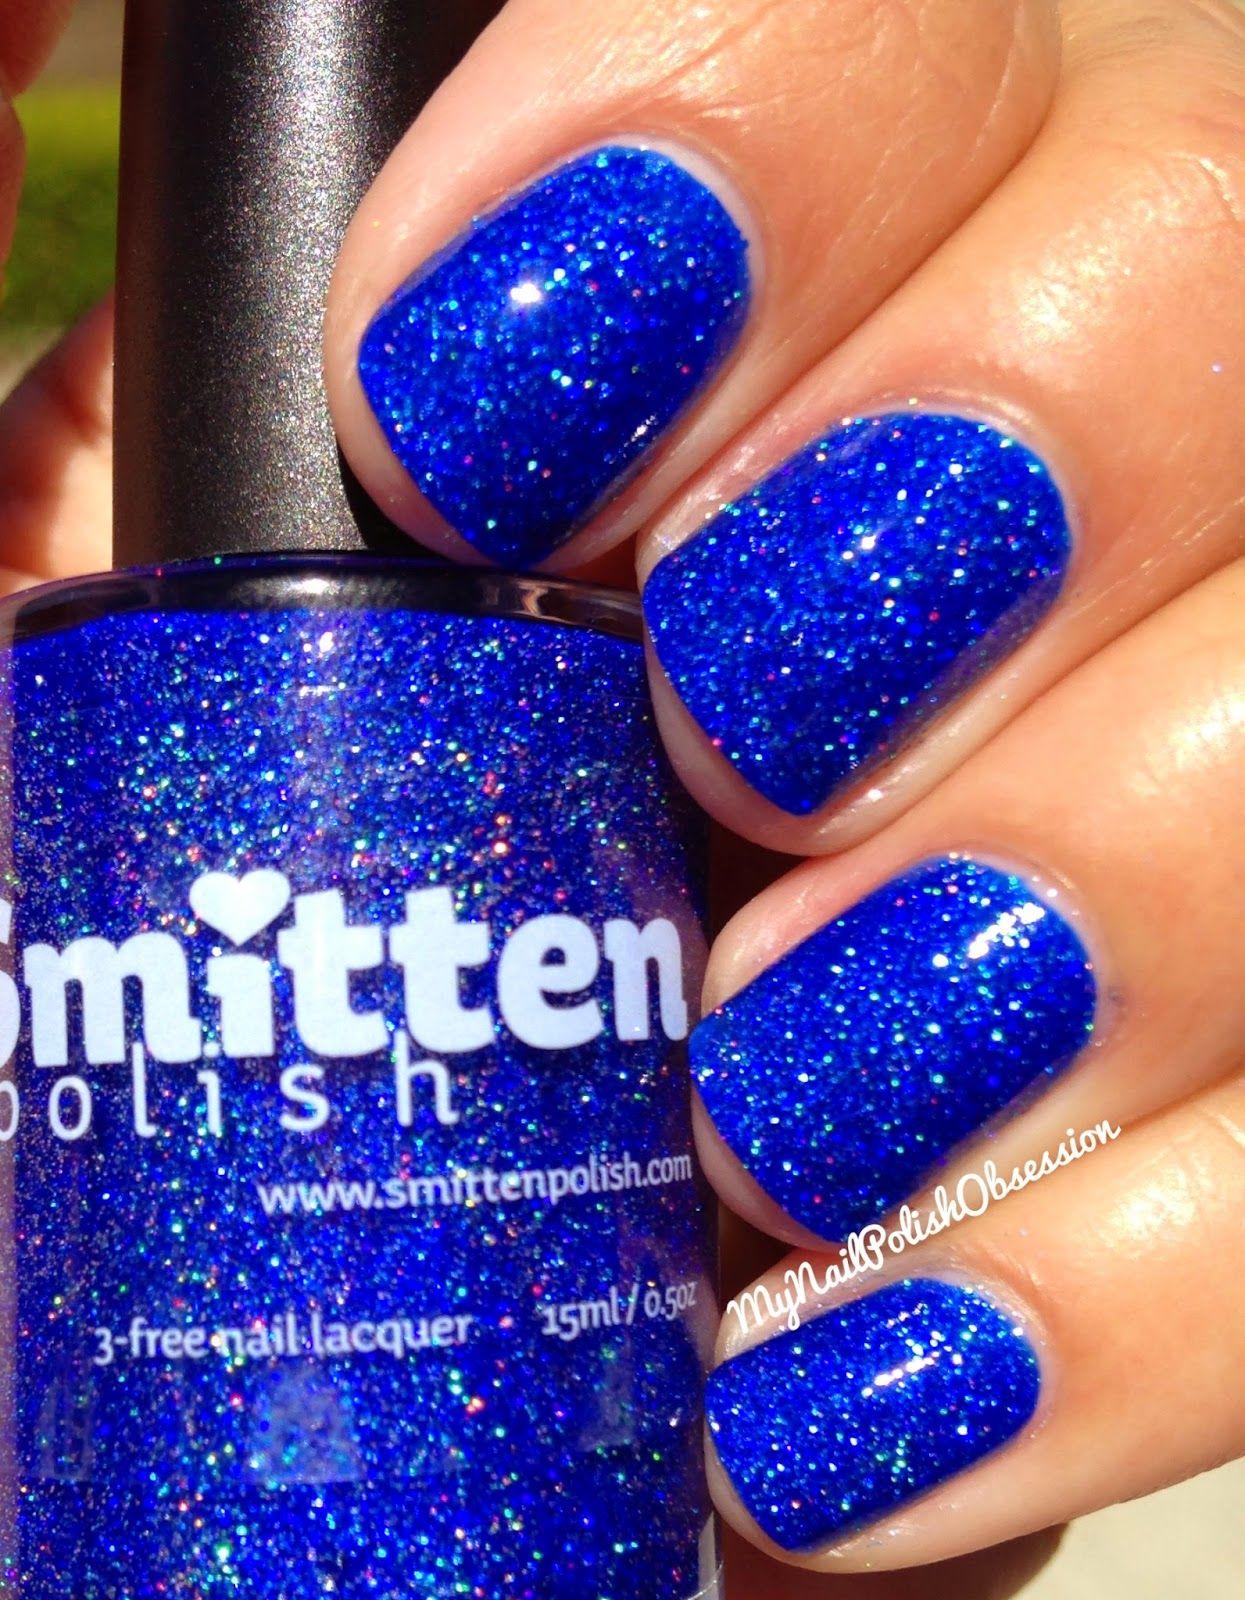 Smitten Polish Summer 2014 Collection